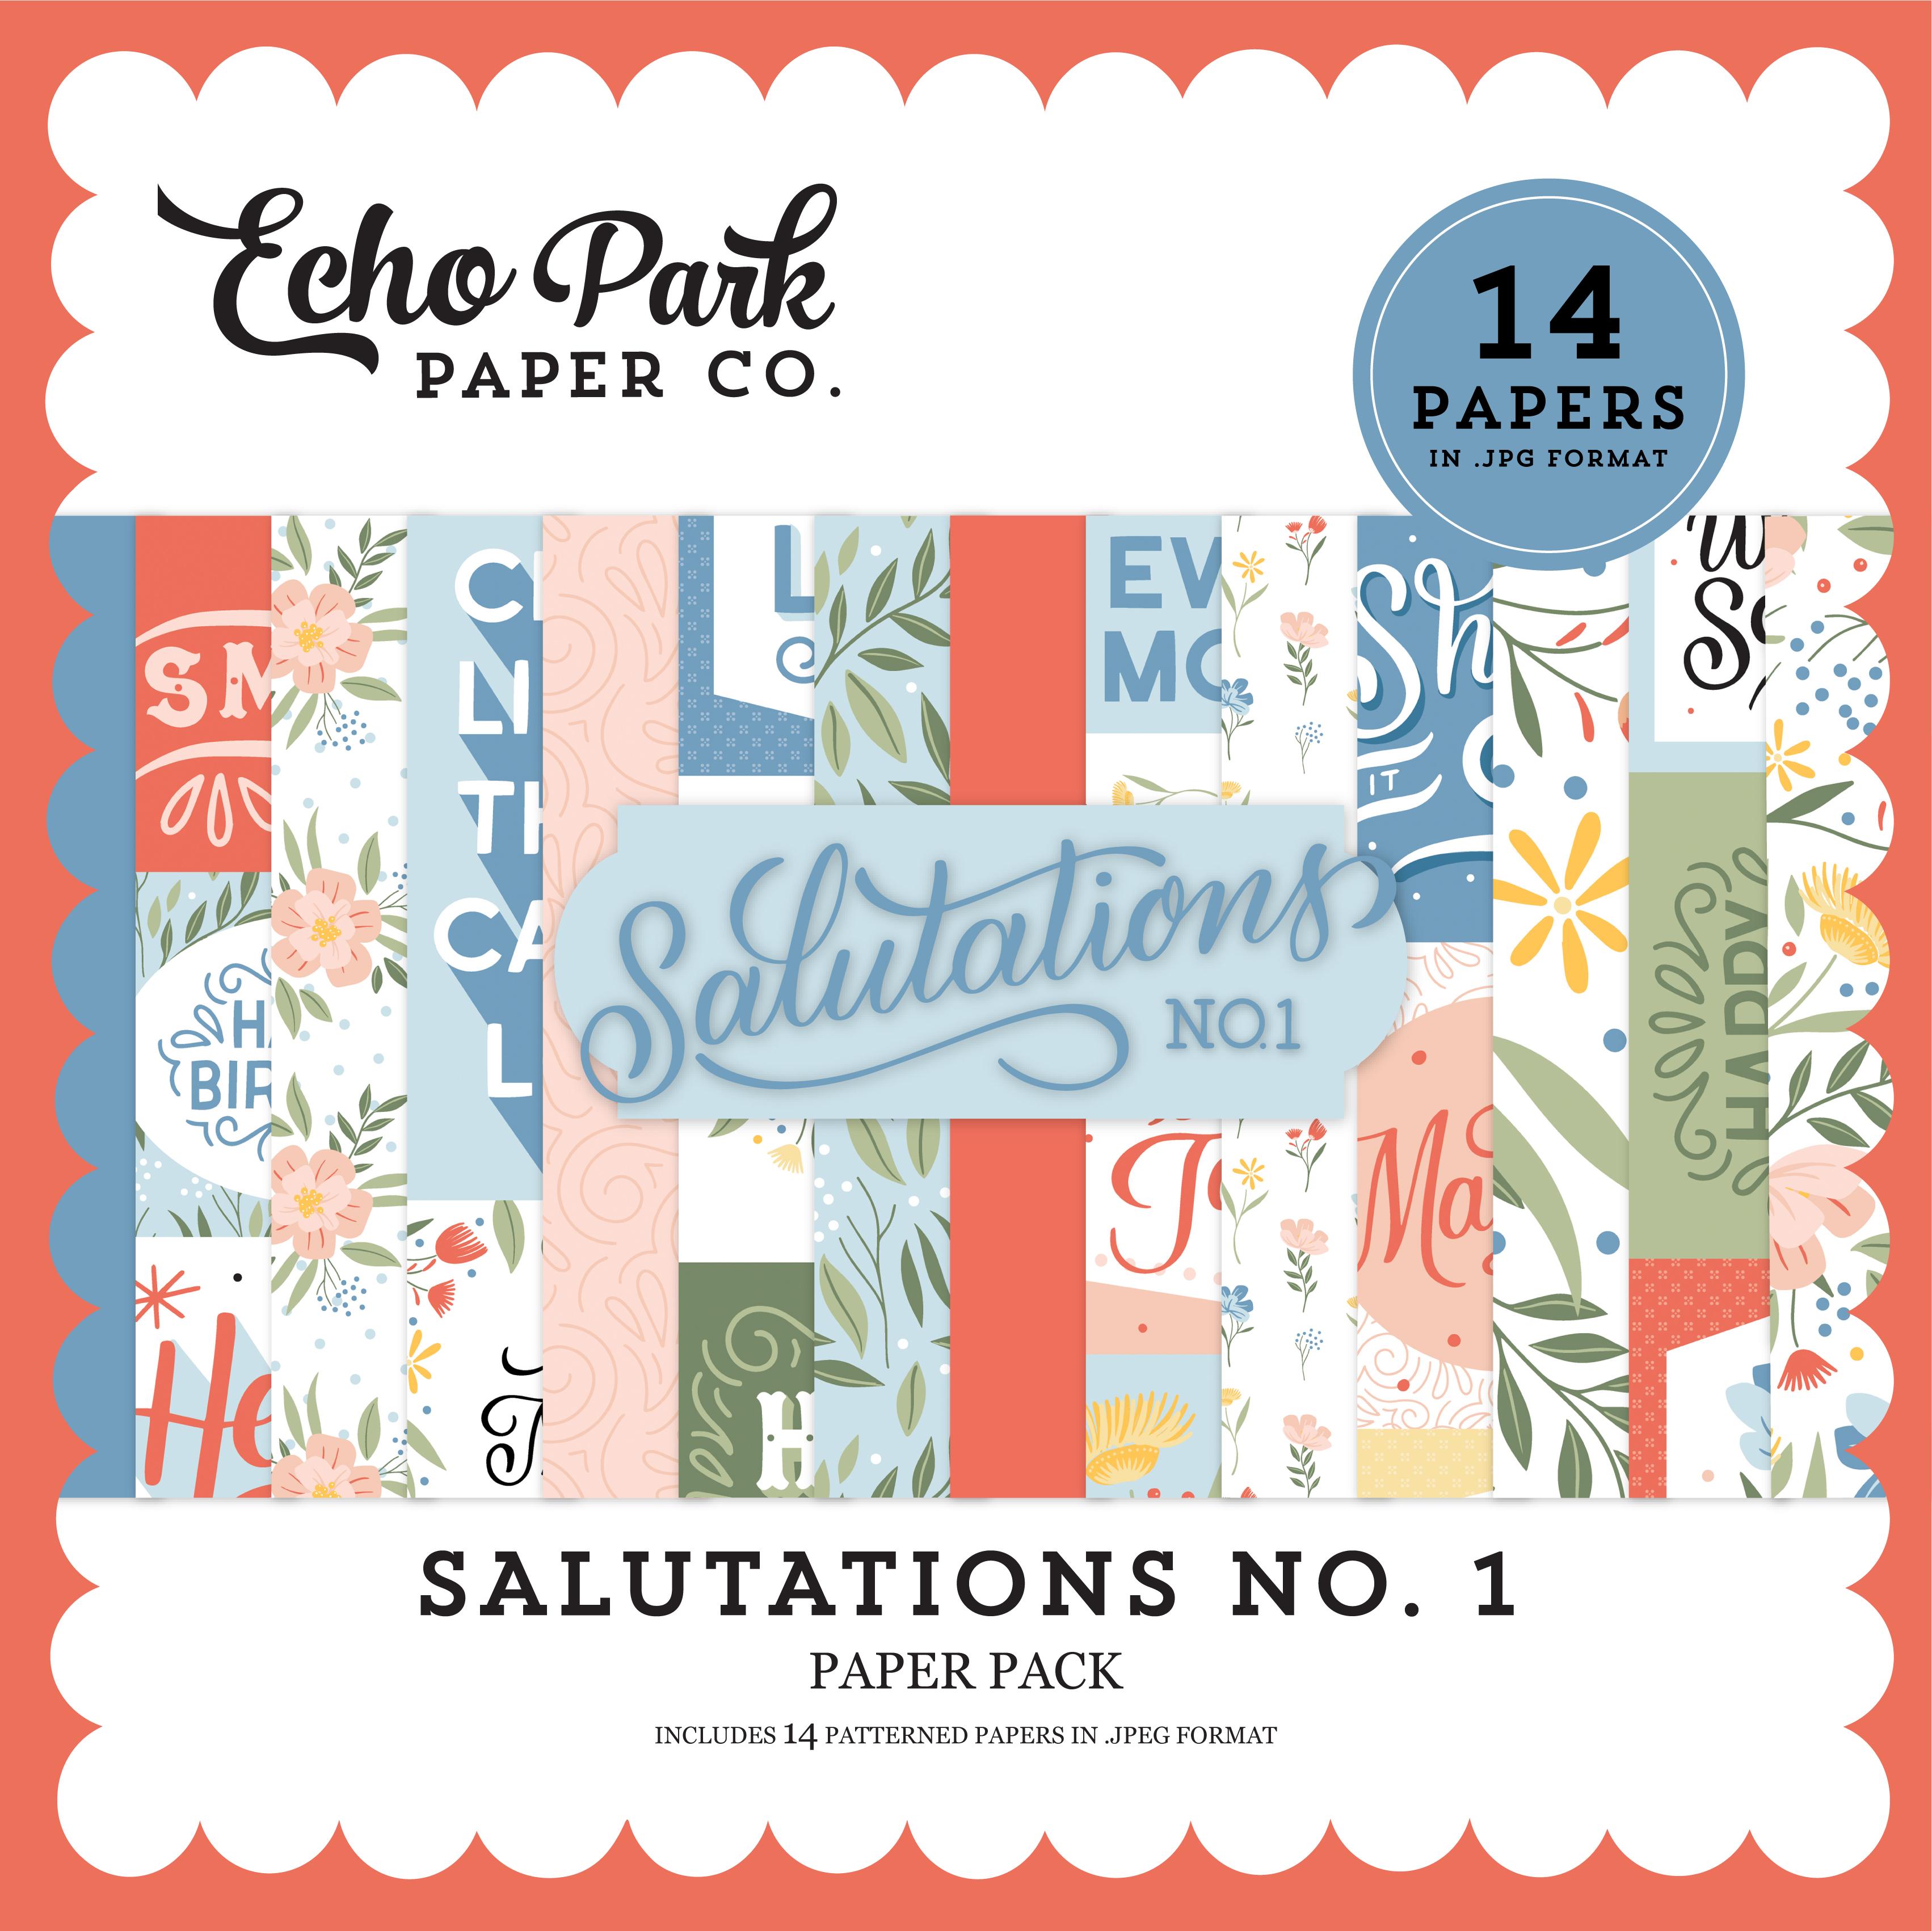 Salutations No. 1 Paper Pack